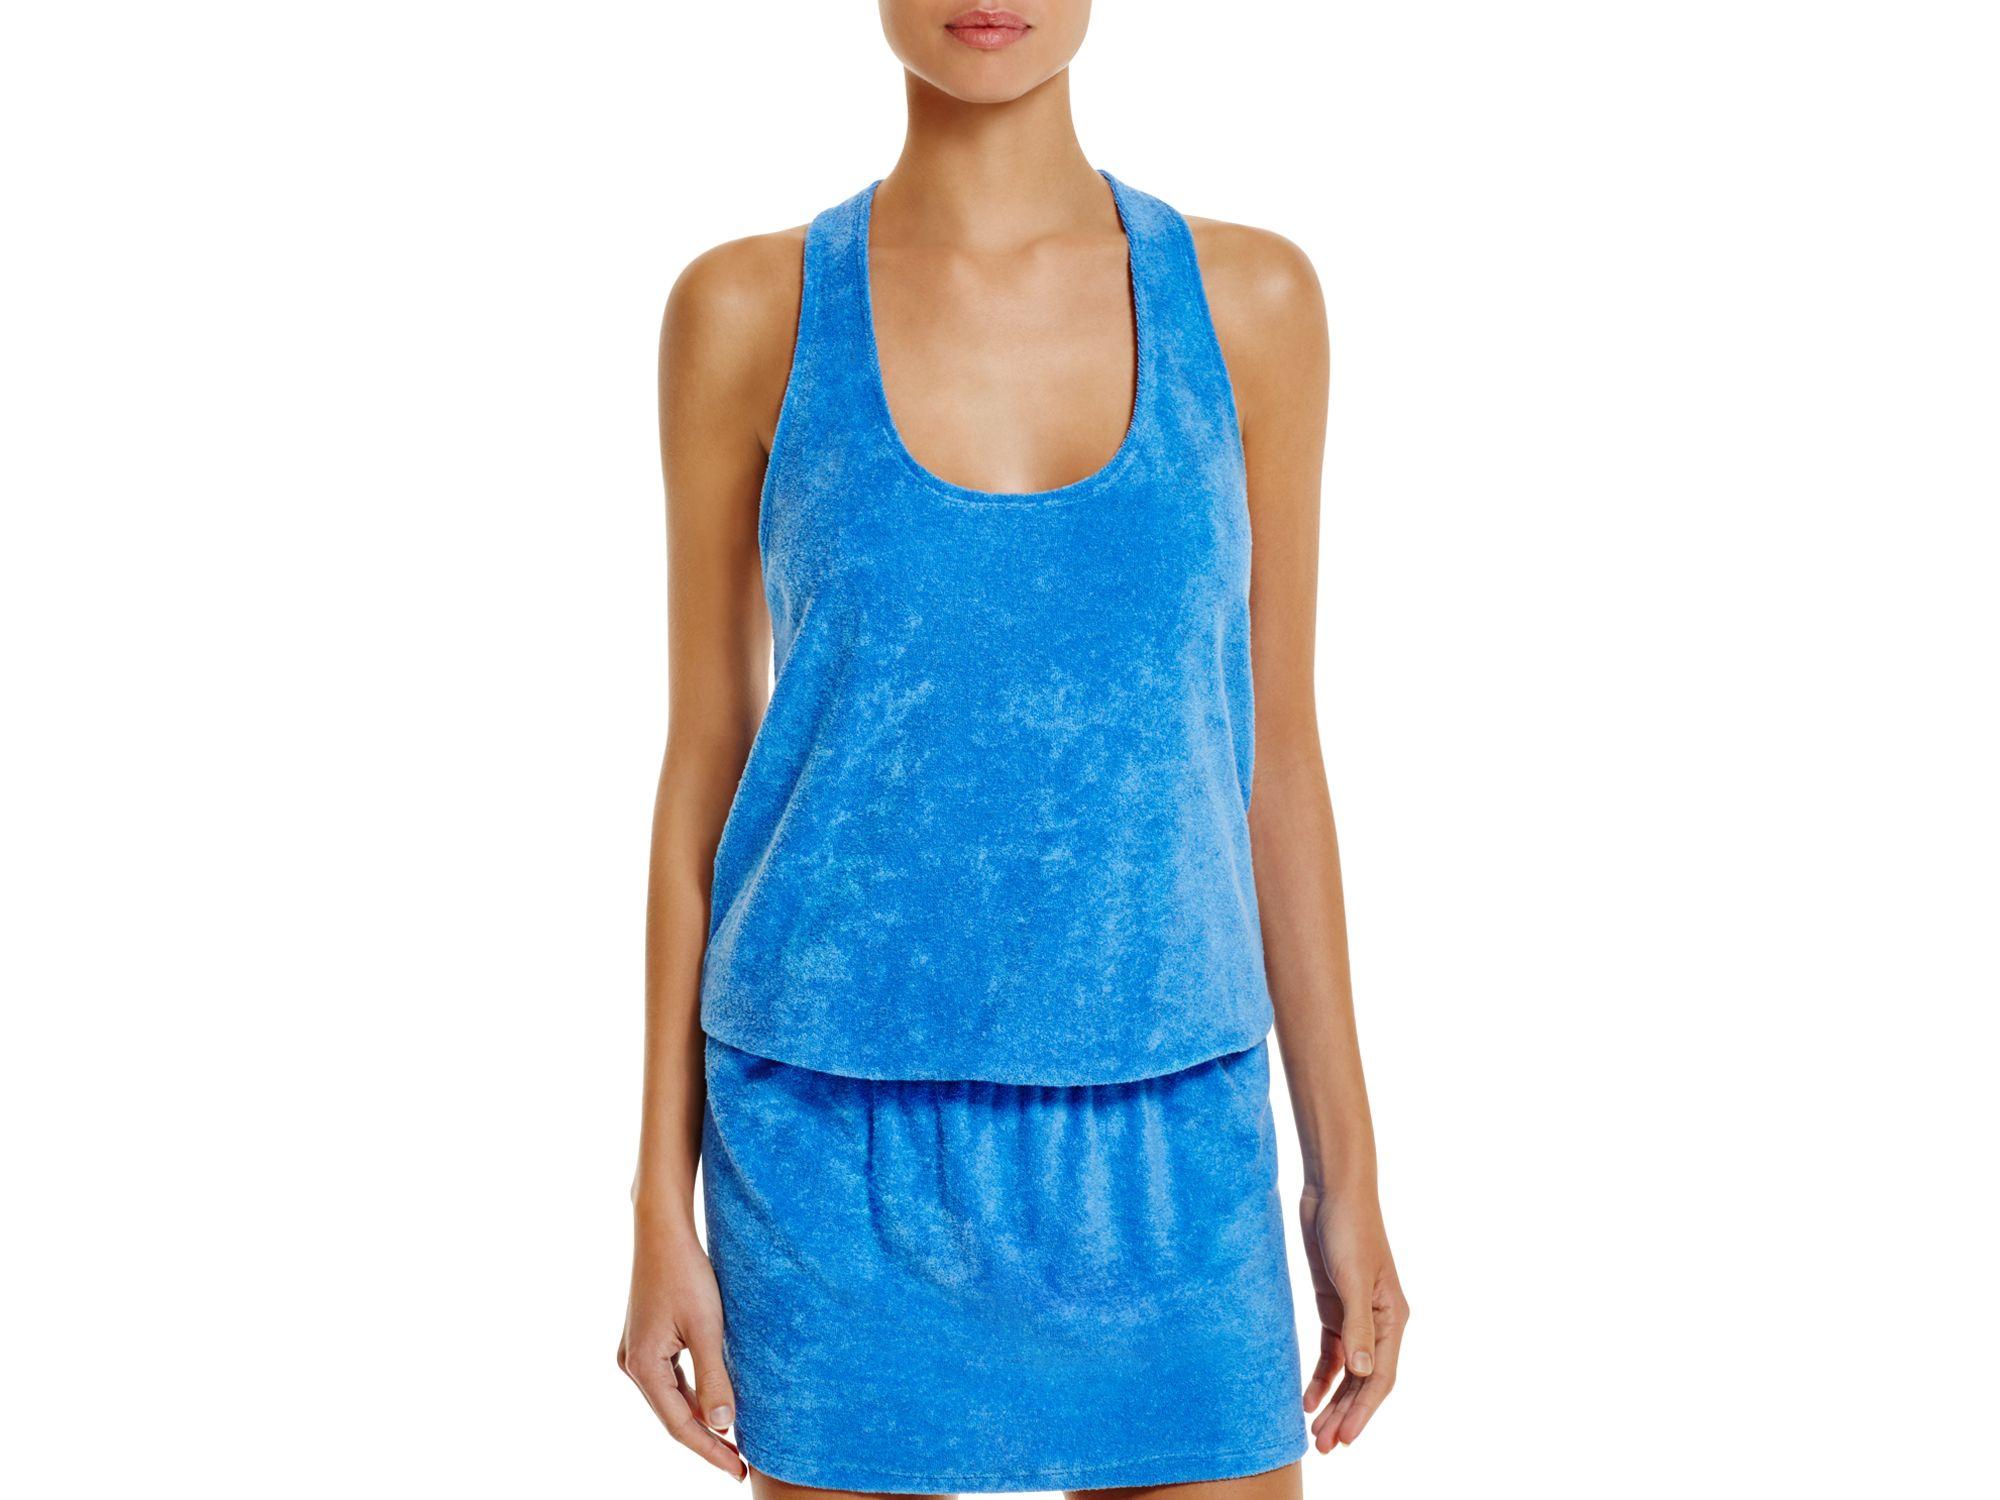 Beach Cover Up Dresses Walmart | Saddha